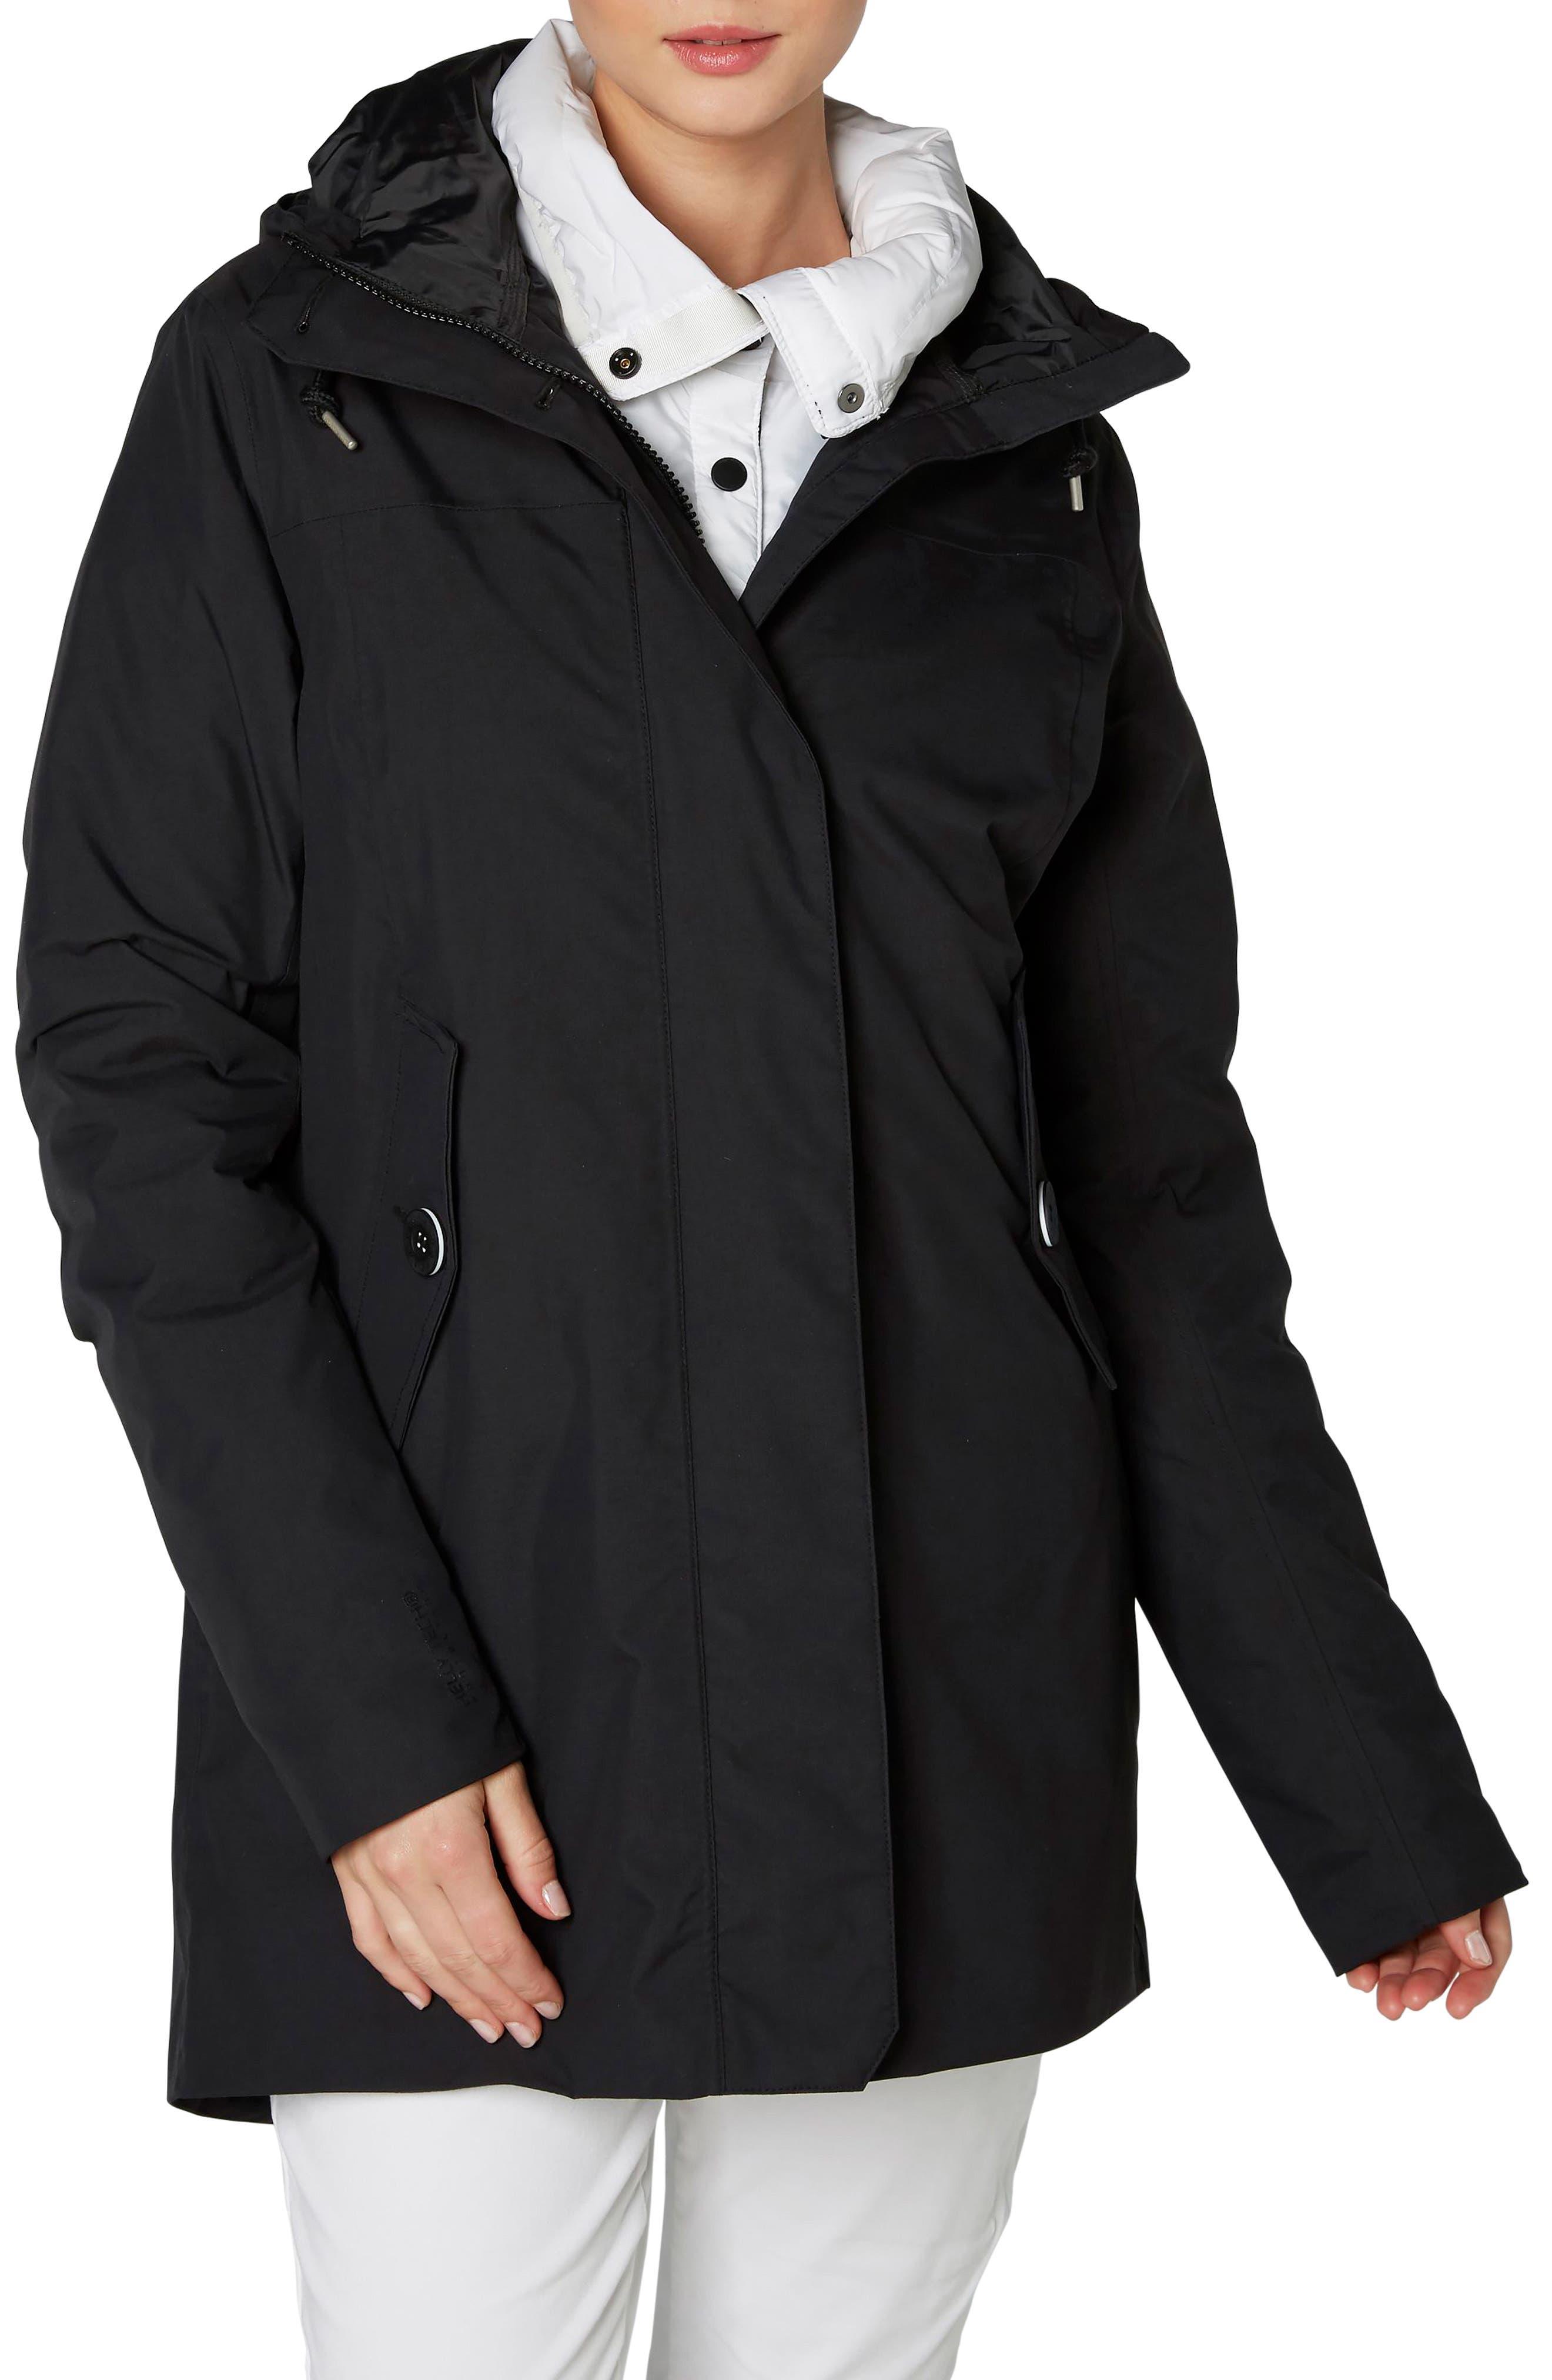 Waterford Weatherproof Hooded Parka,                             Main thumbnail 1, color,                             Black